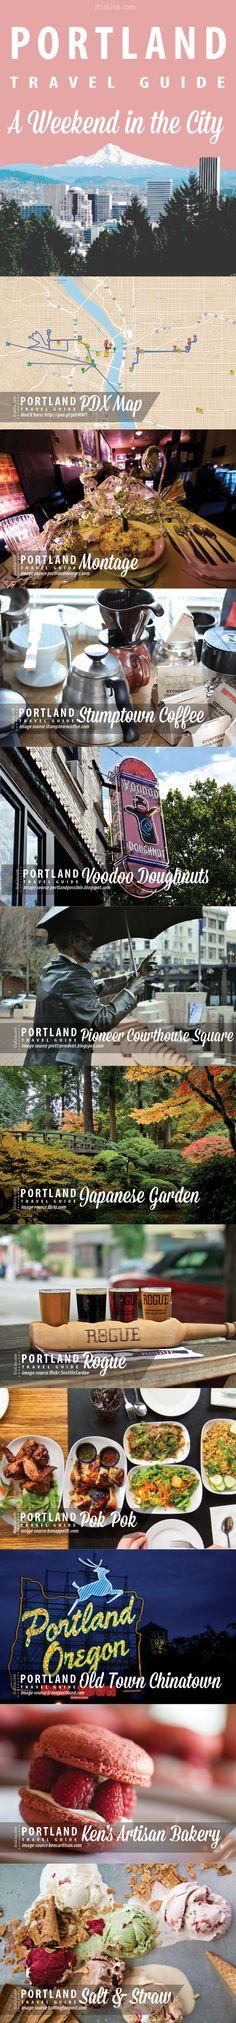 Portland Travel Guide | itsaLisa.com